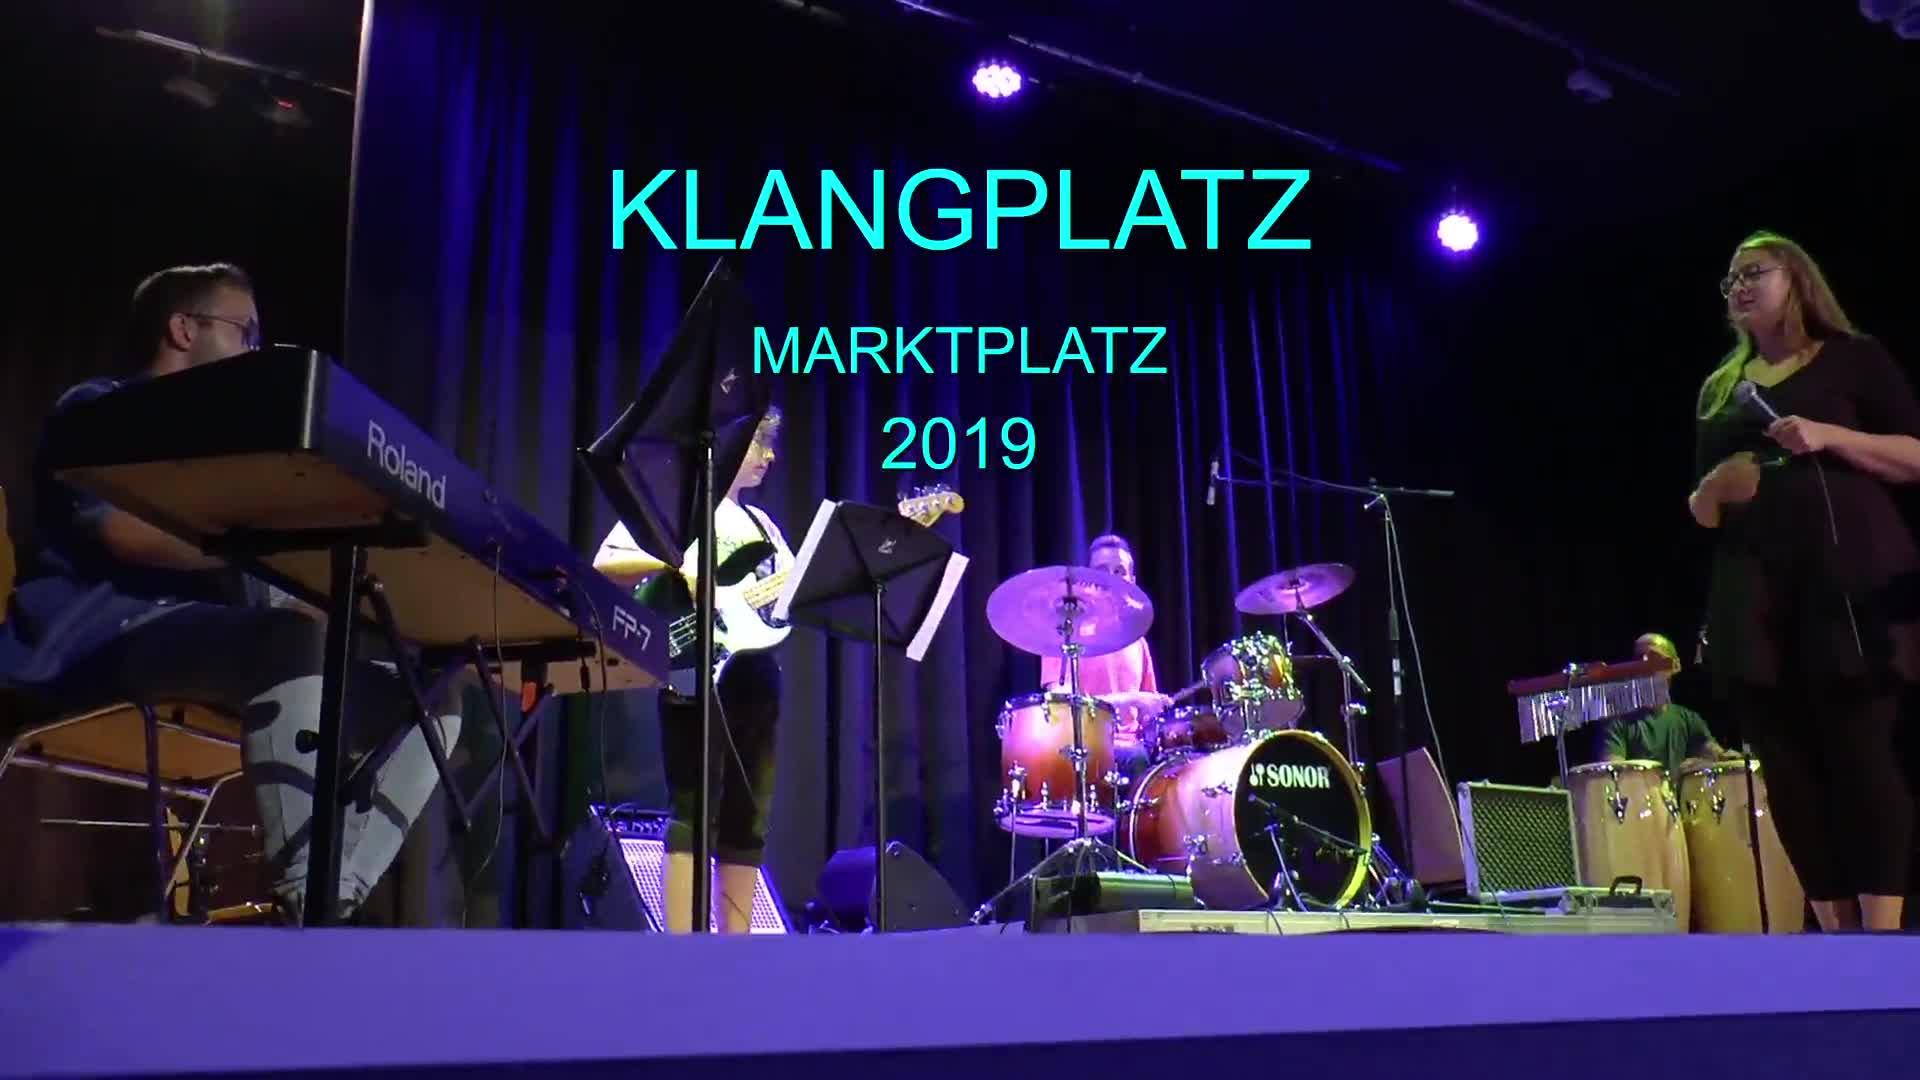 Klangplatz Marktplatz